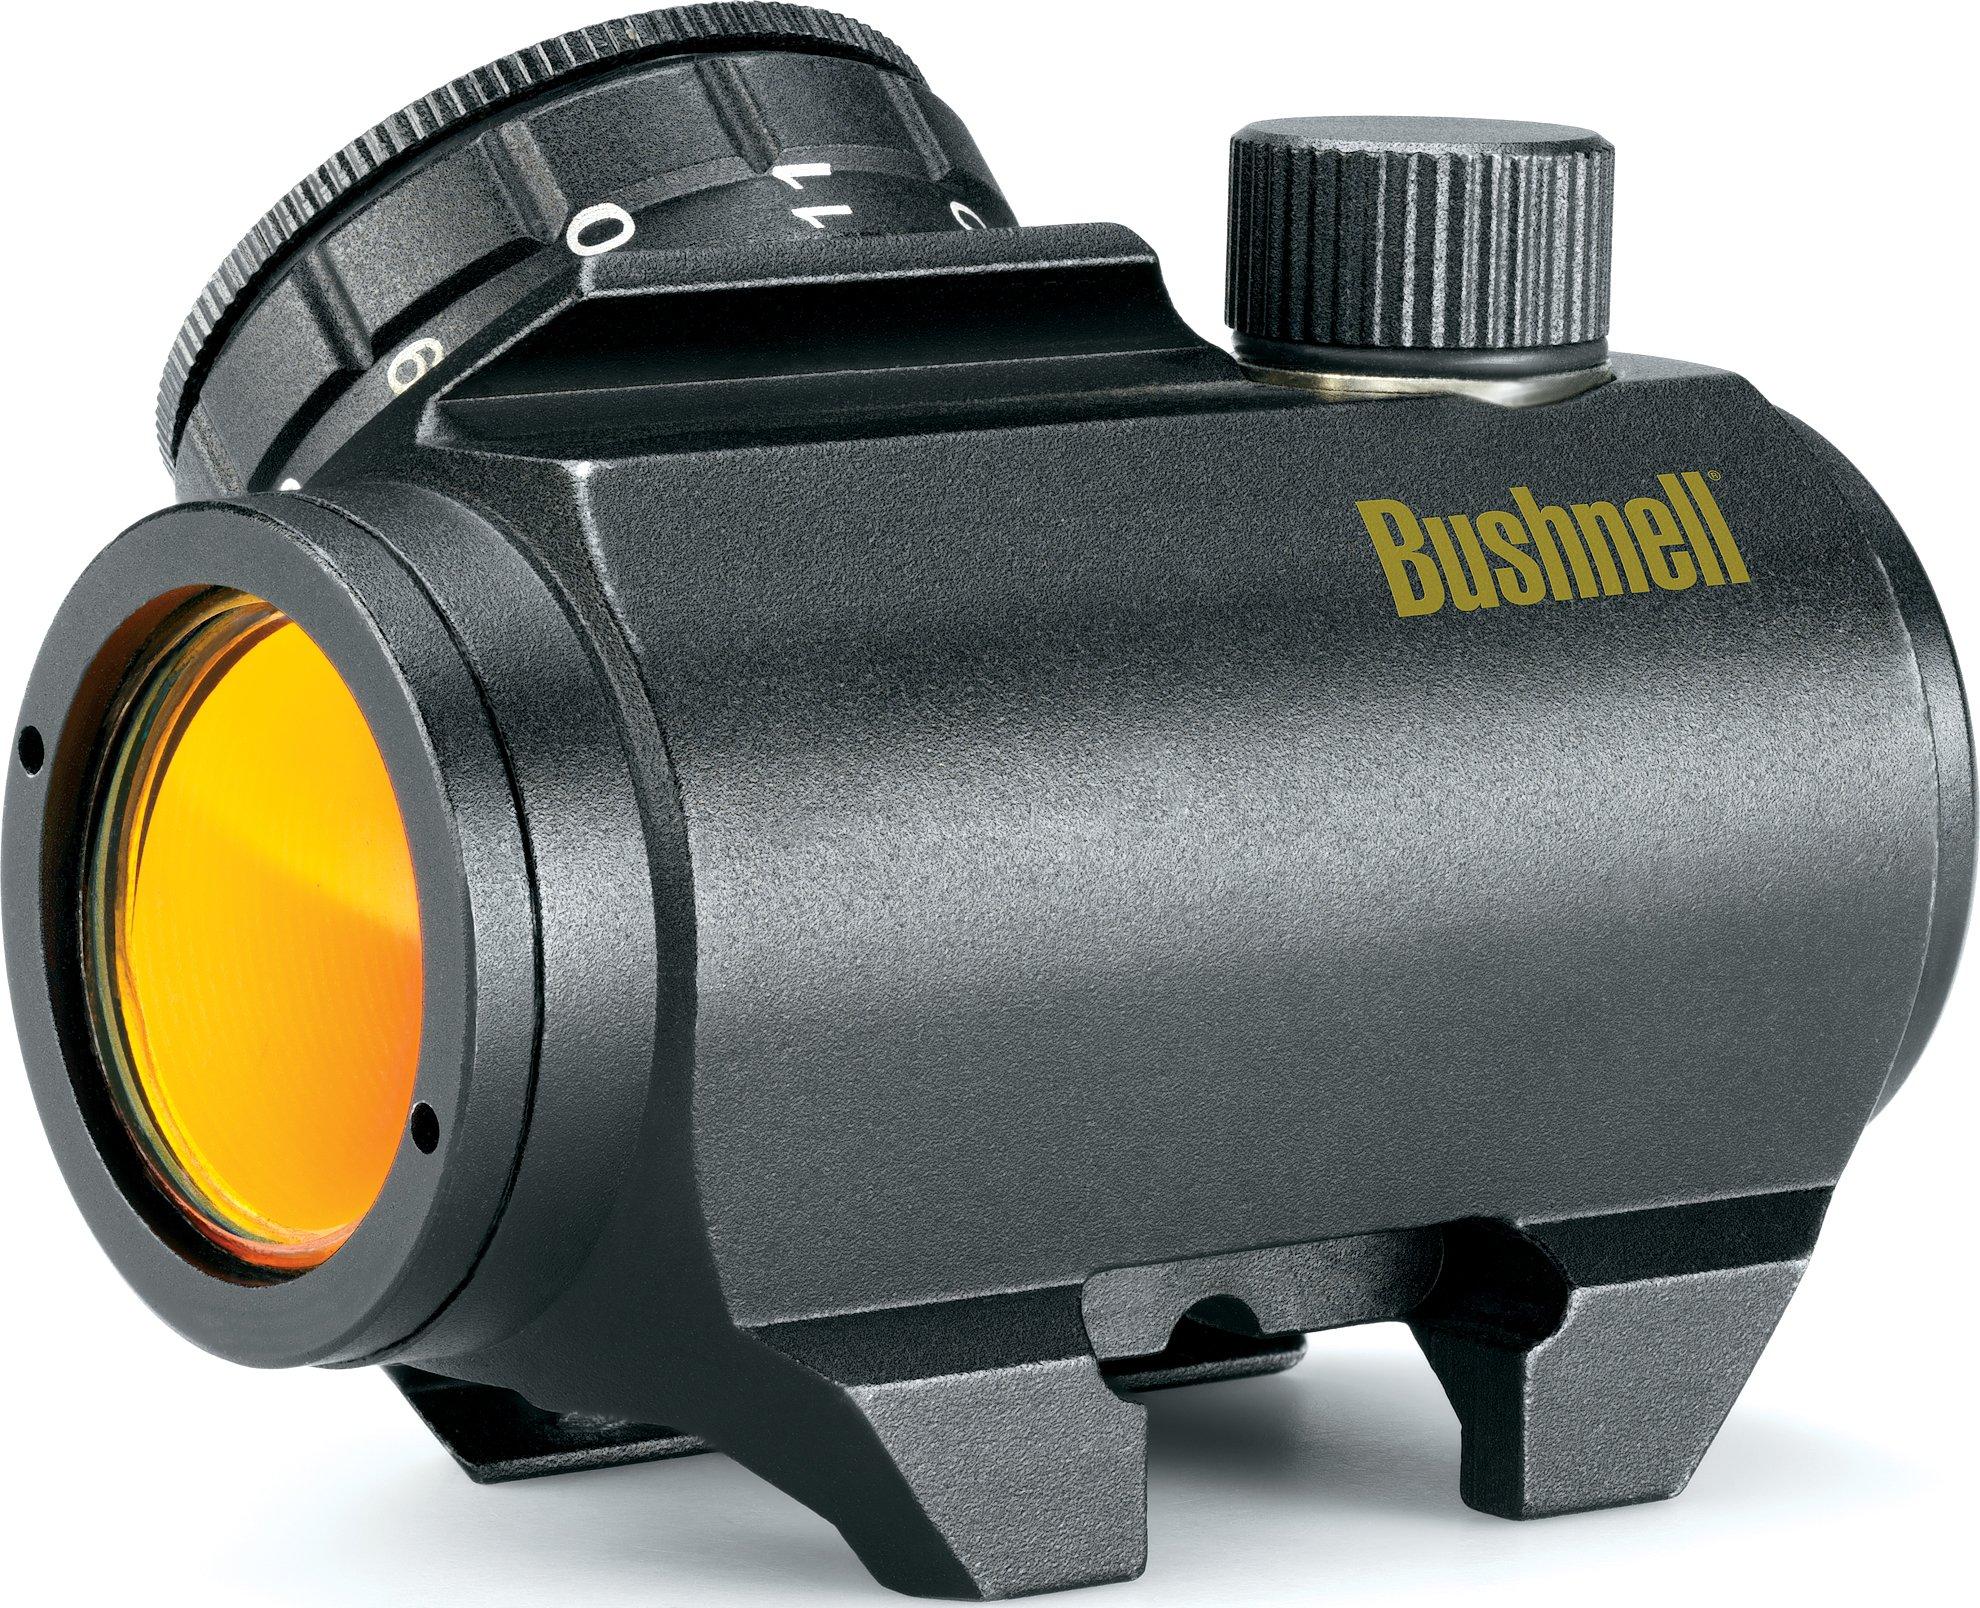 Bushnell Trophy TRS 25 Riflescope 1x25mm